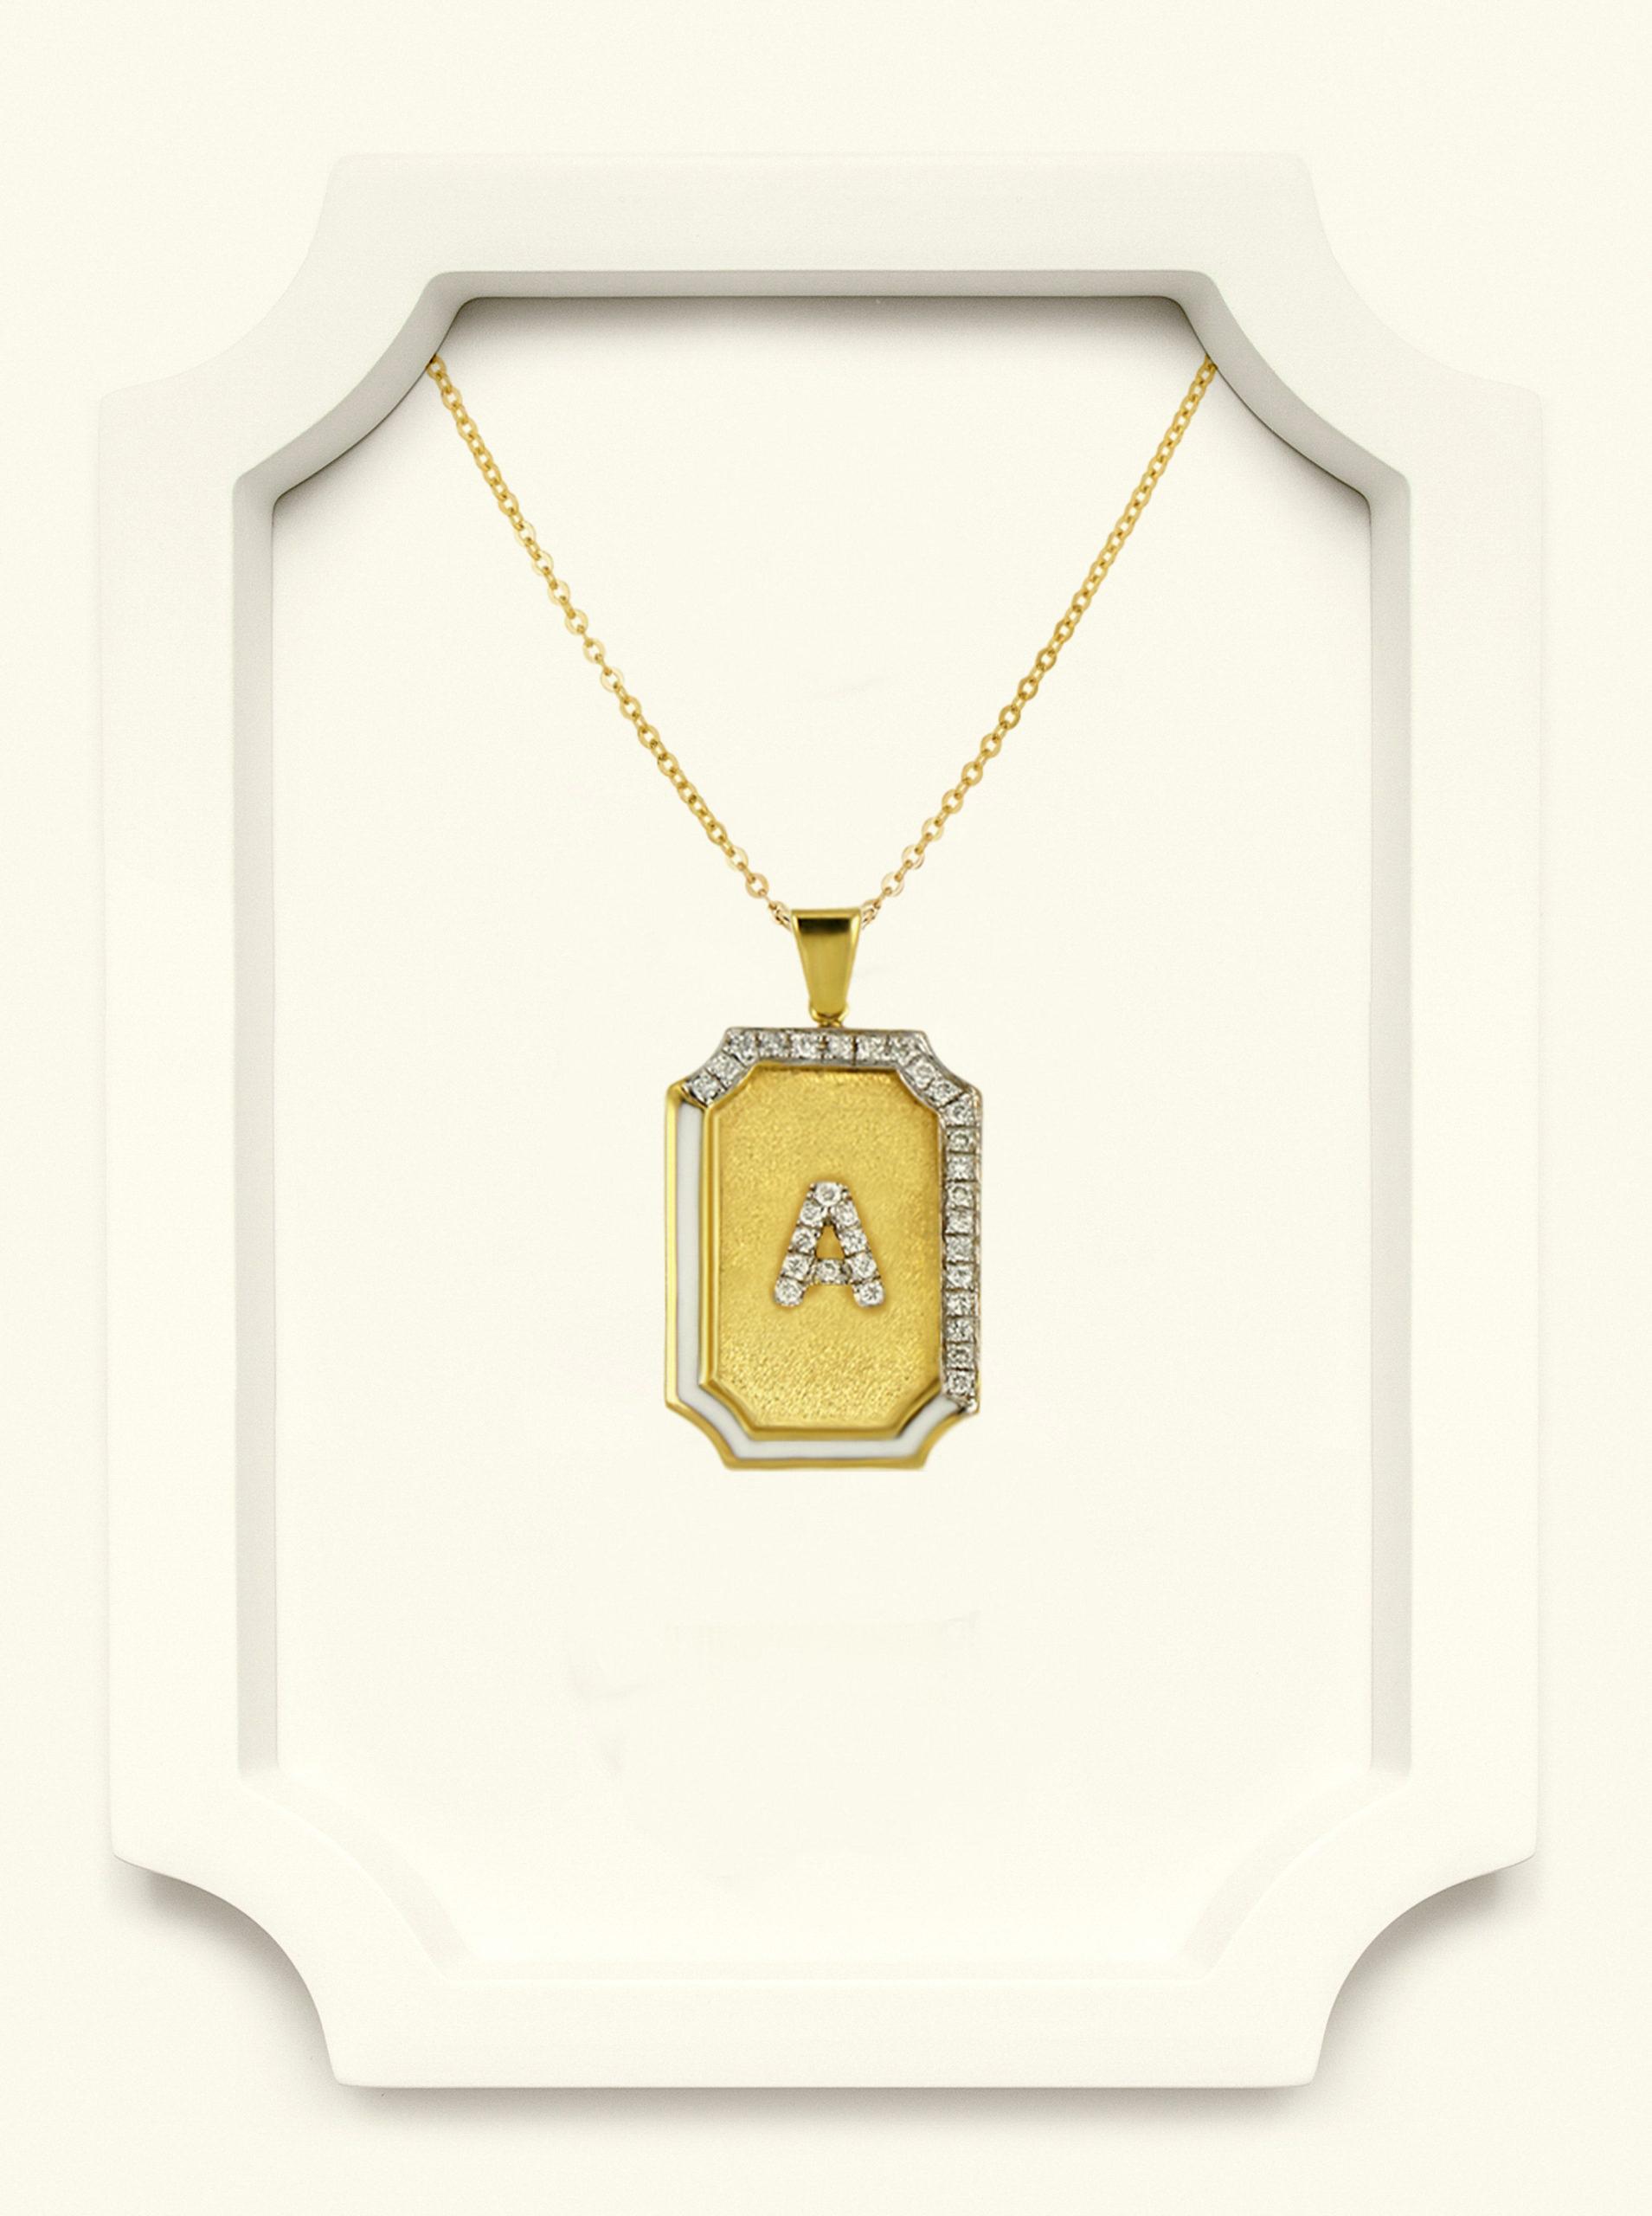 Saba Yellow Gold Signature Pendant With White Enamel